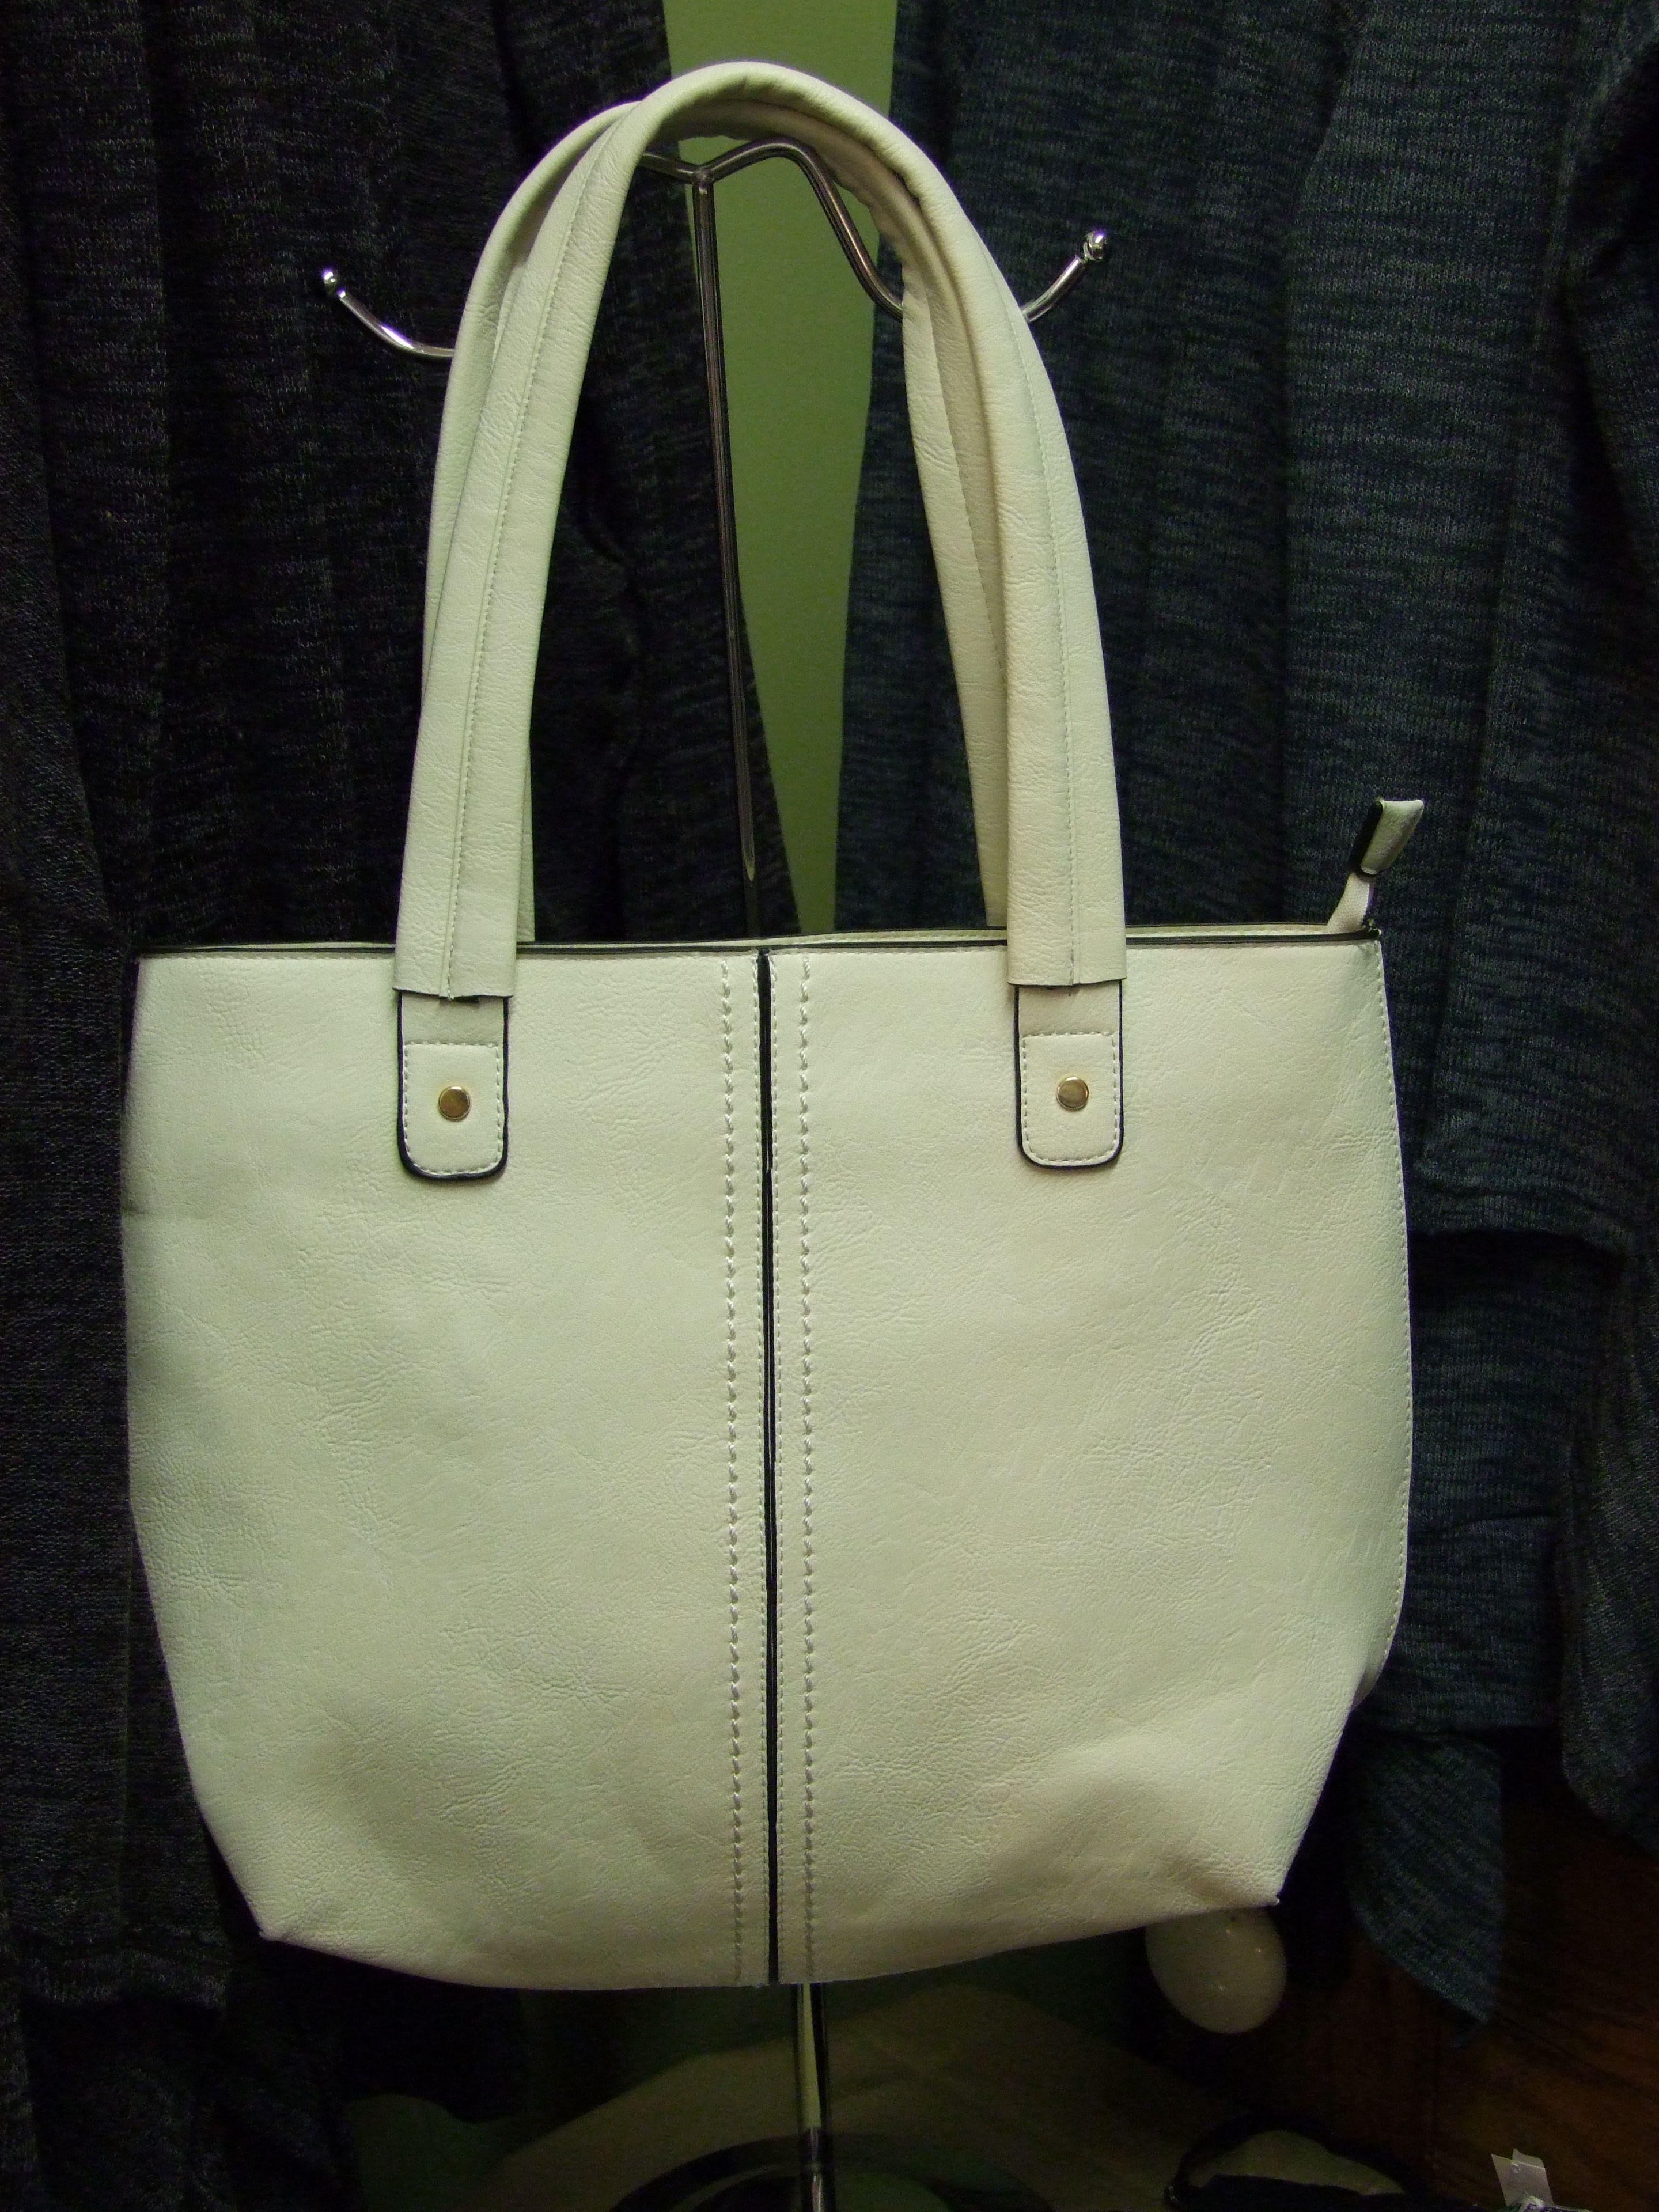 Handbag From B Lush By Passion